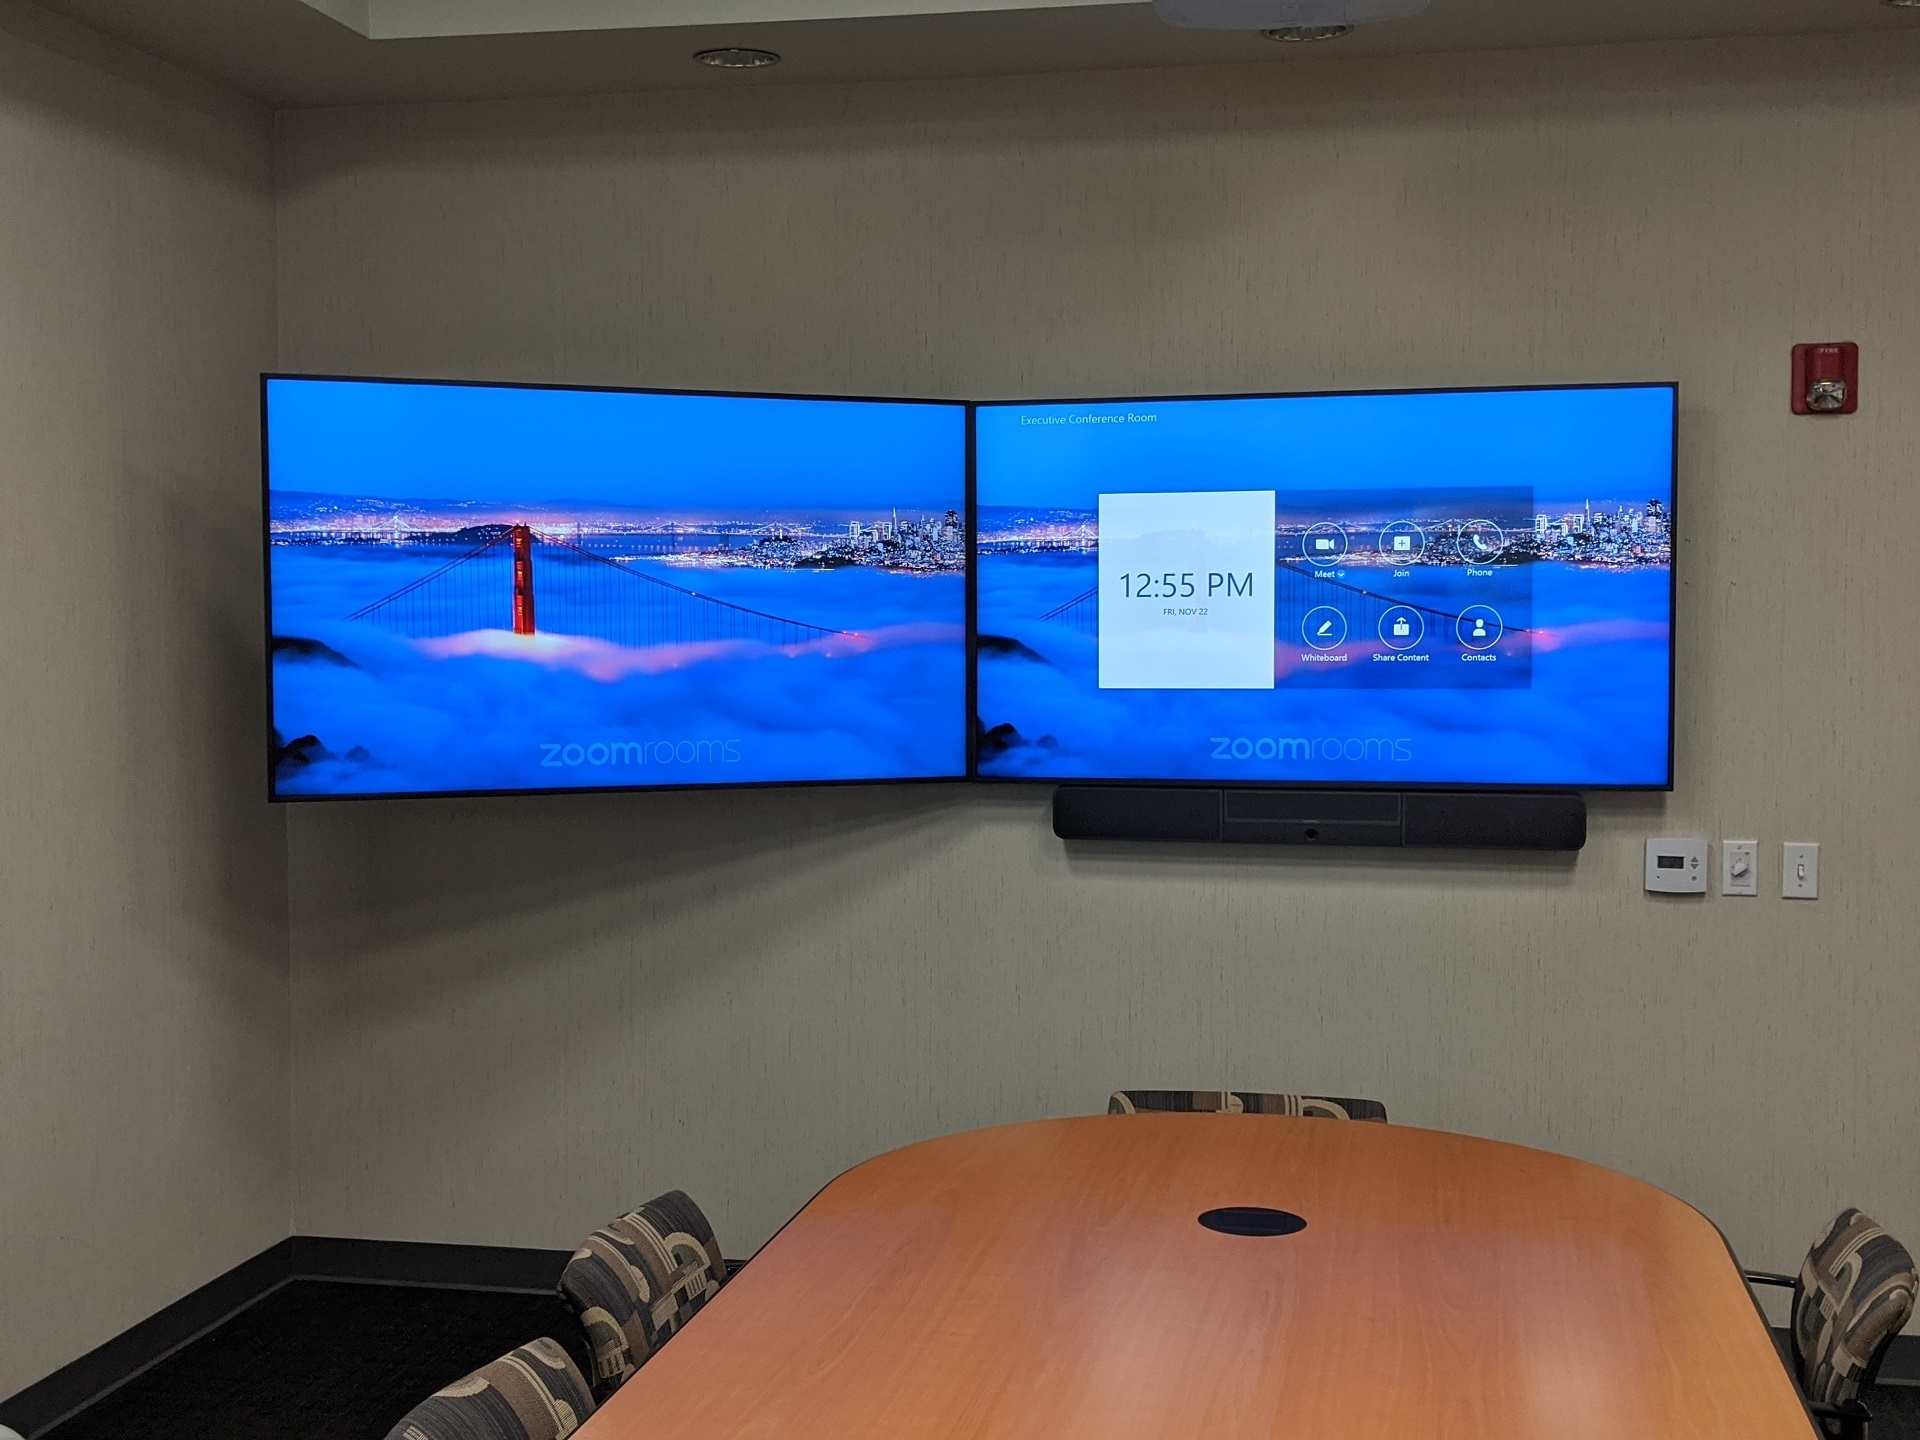 IGI-Corporate-Audio-Visual-Integration-2